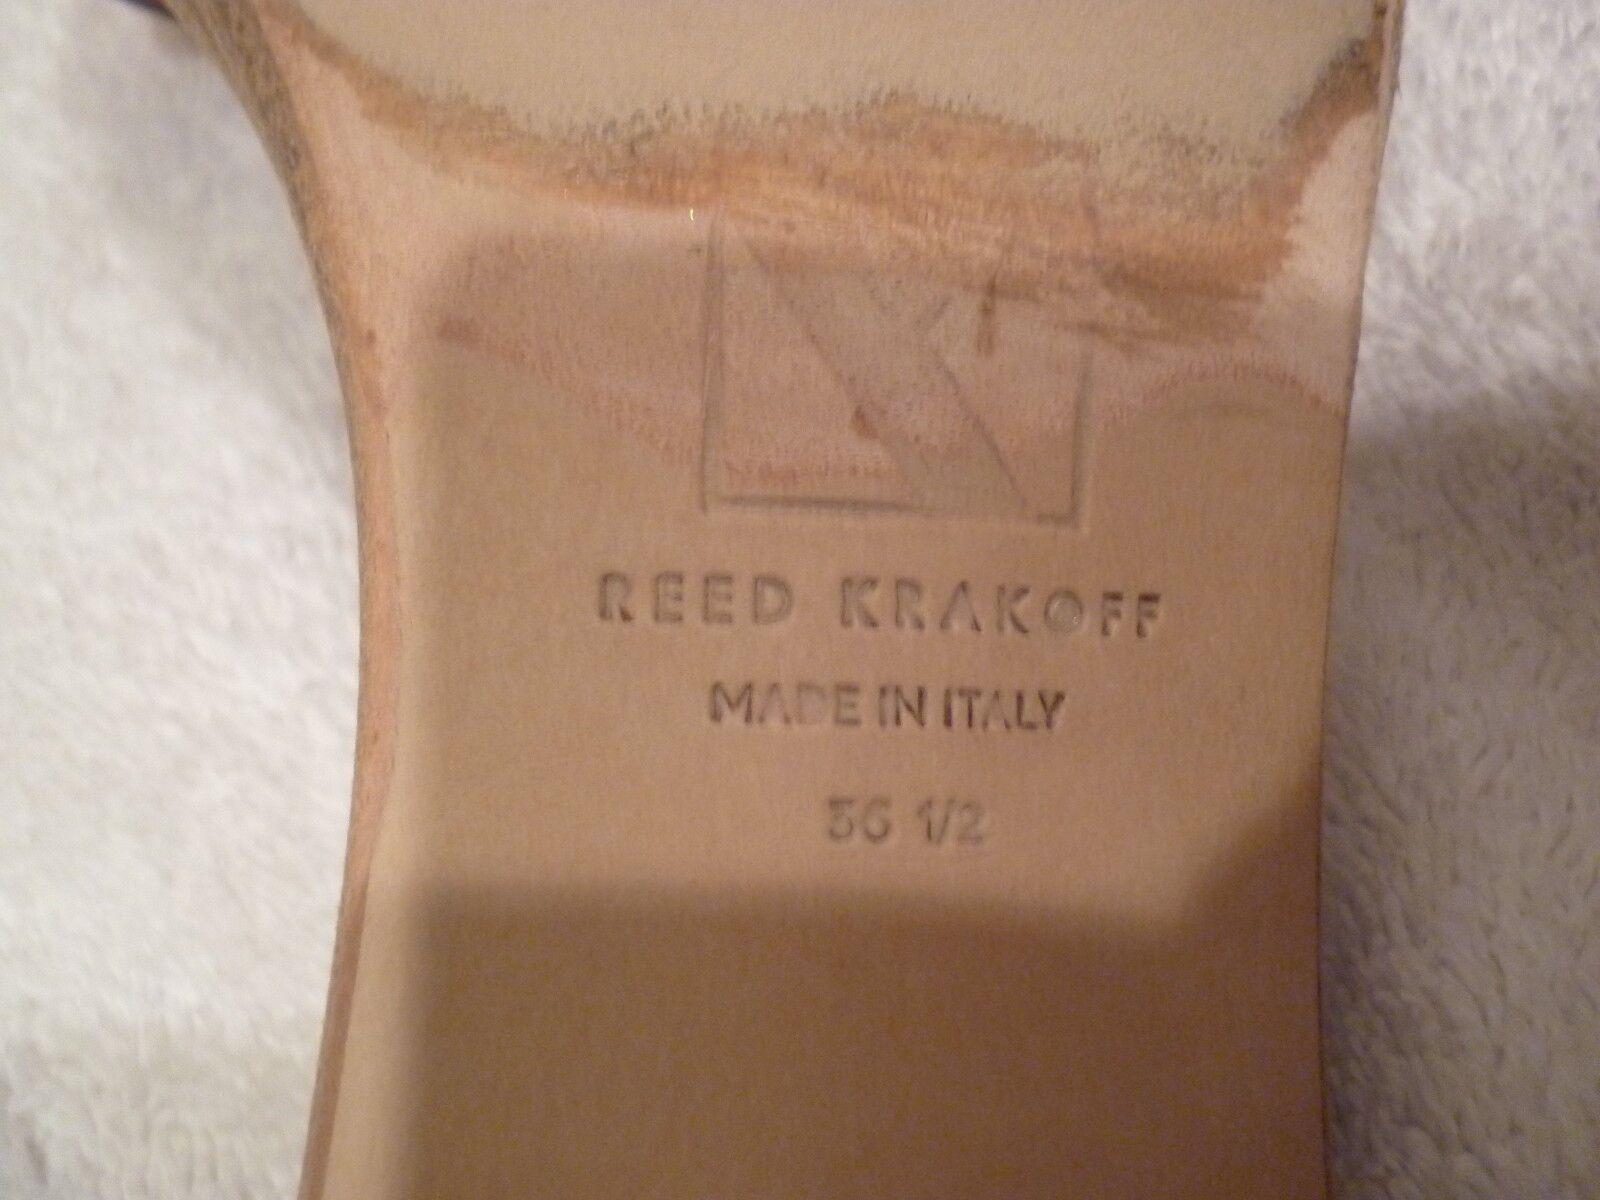 REED nude KRAKOFF ankle wrap nude REED Sandales heels SZ 36.5/6.5 75793e